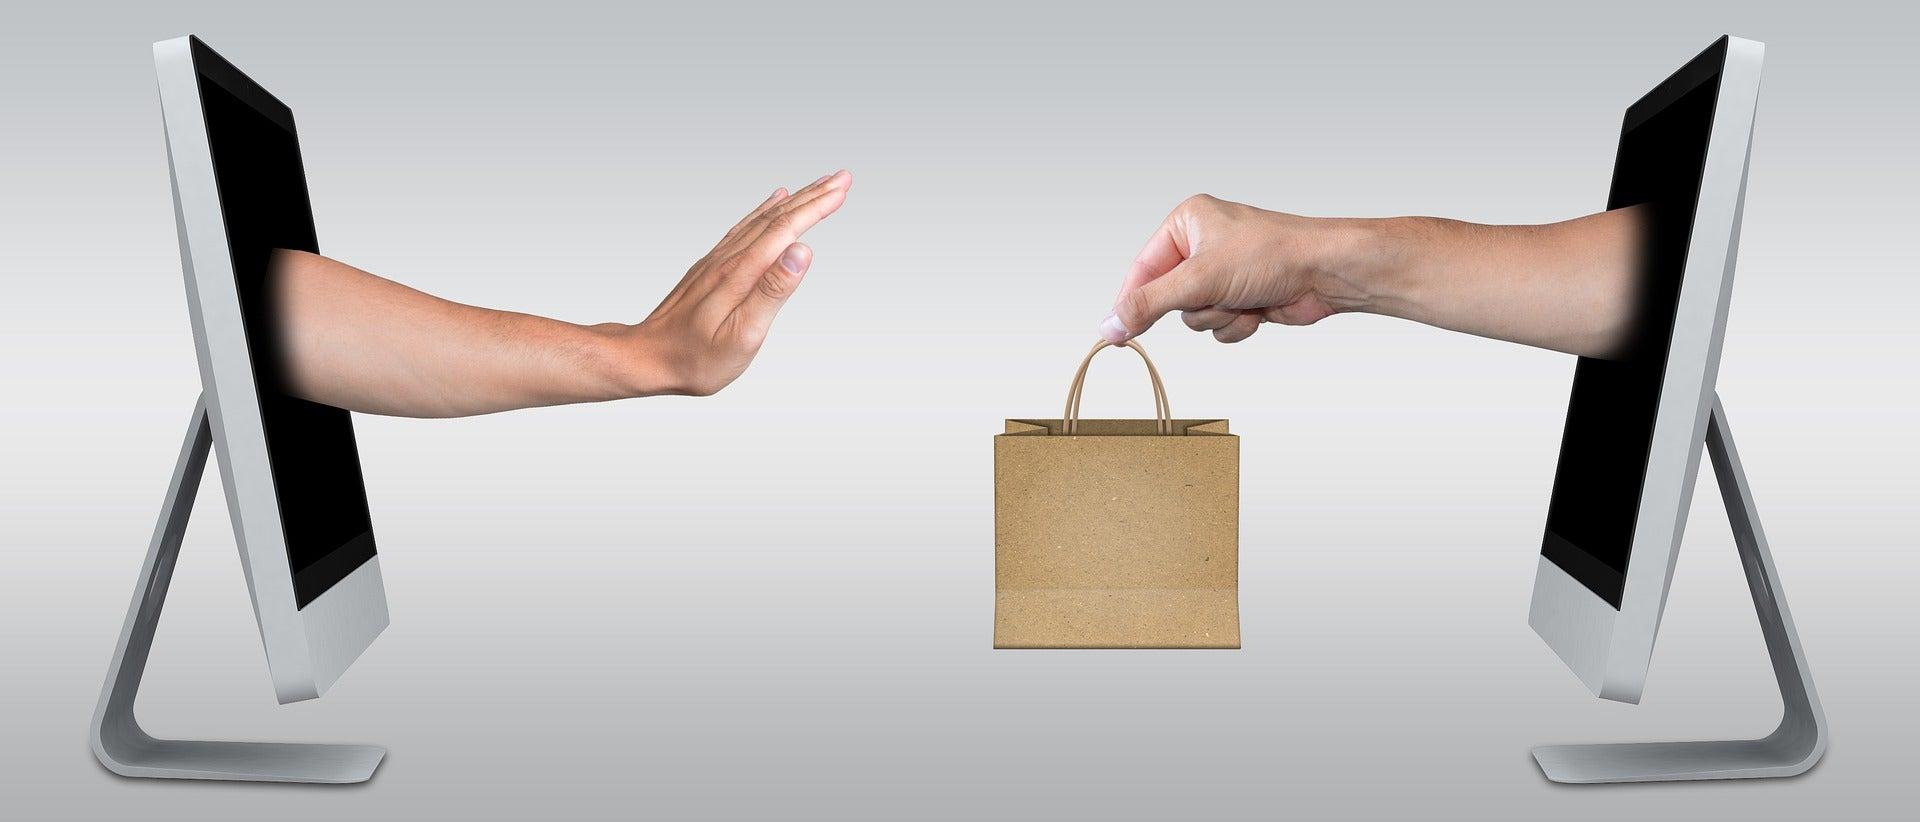 b2b commerce academy complex pricing b2b webshop customer experience